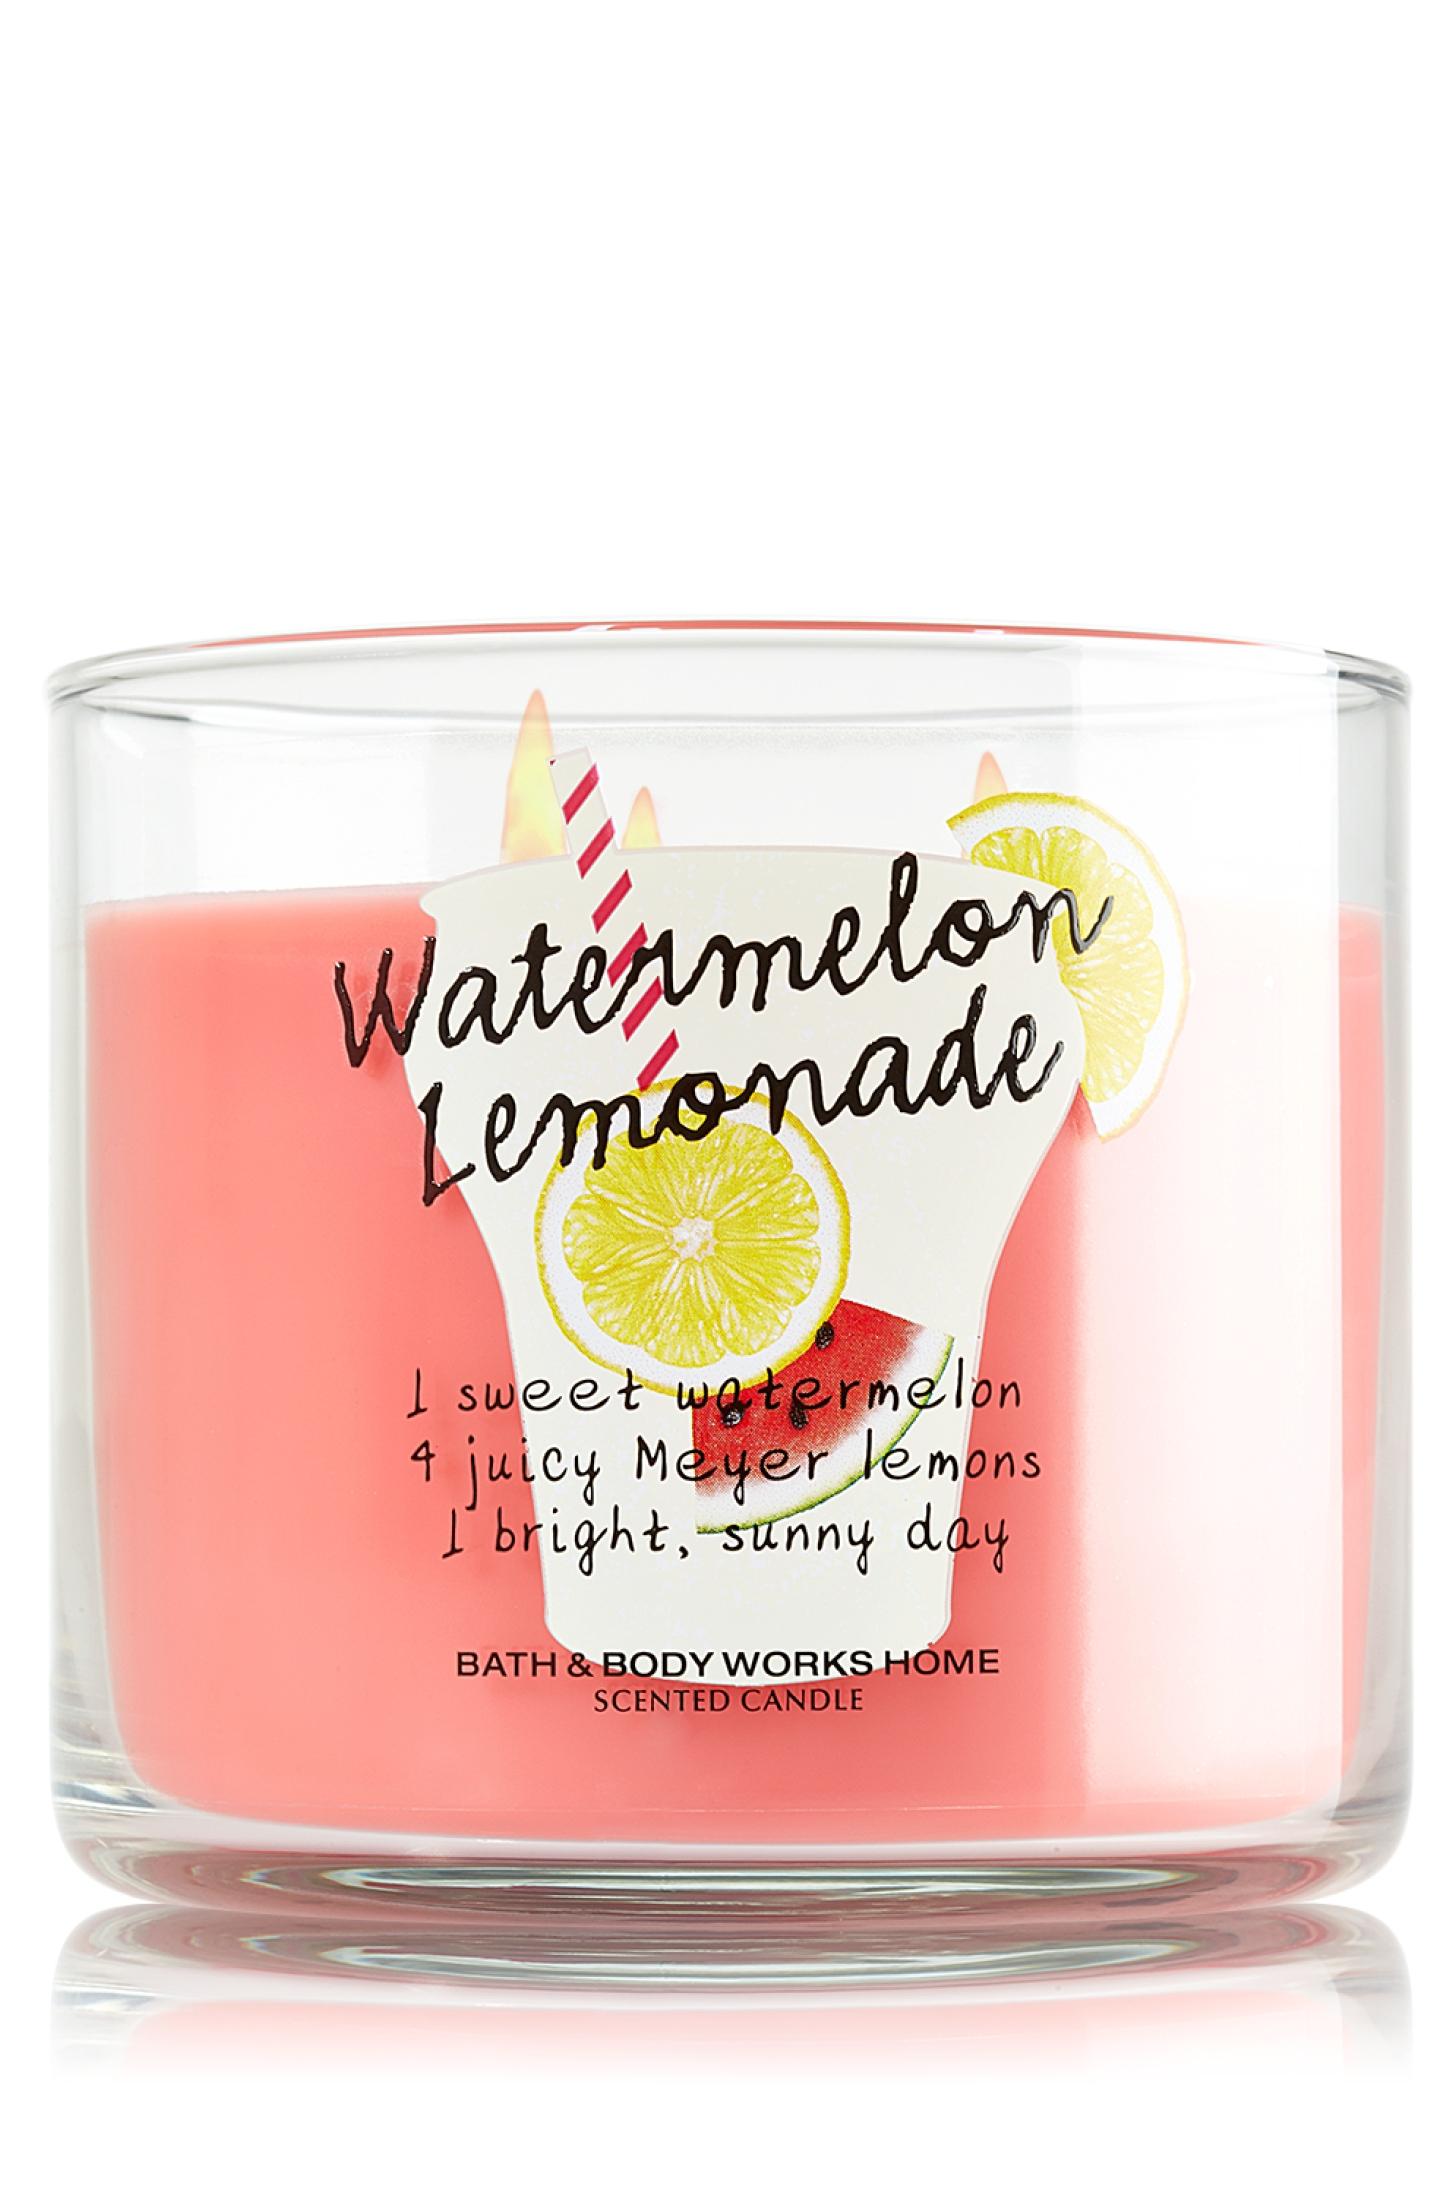 bath and body works watermelon lemonade review